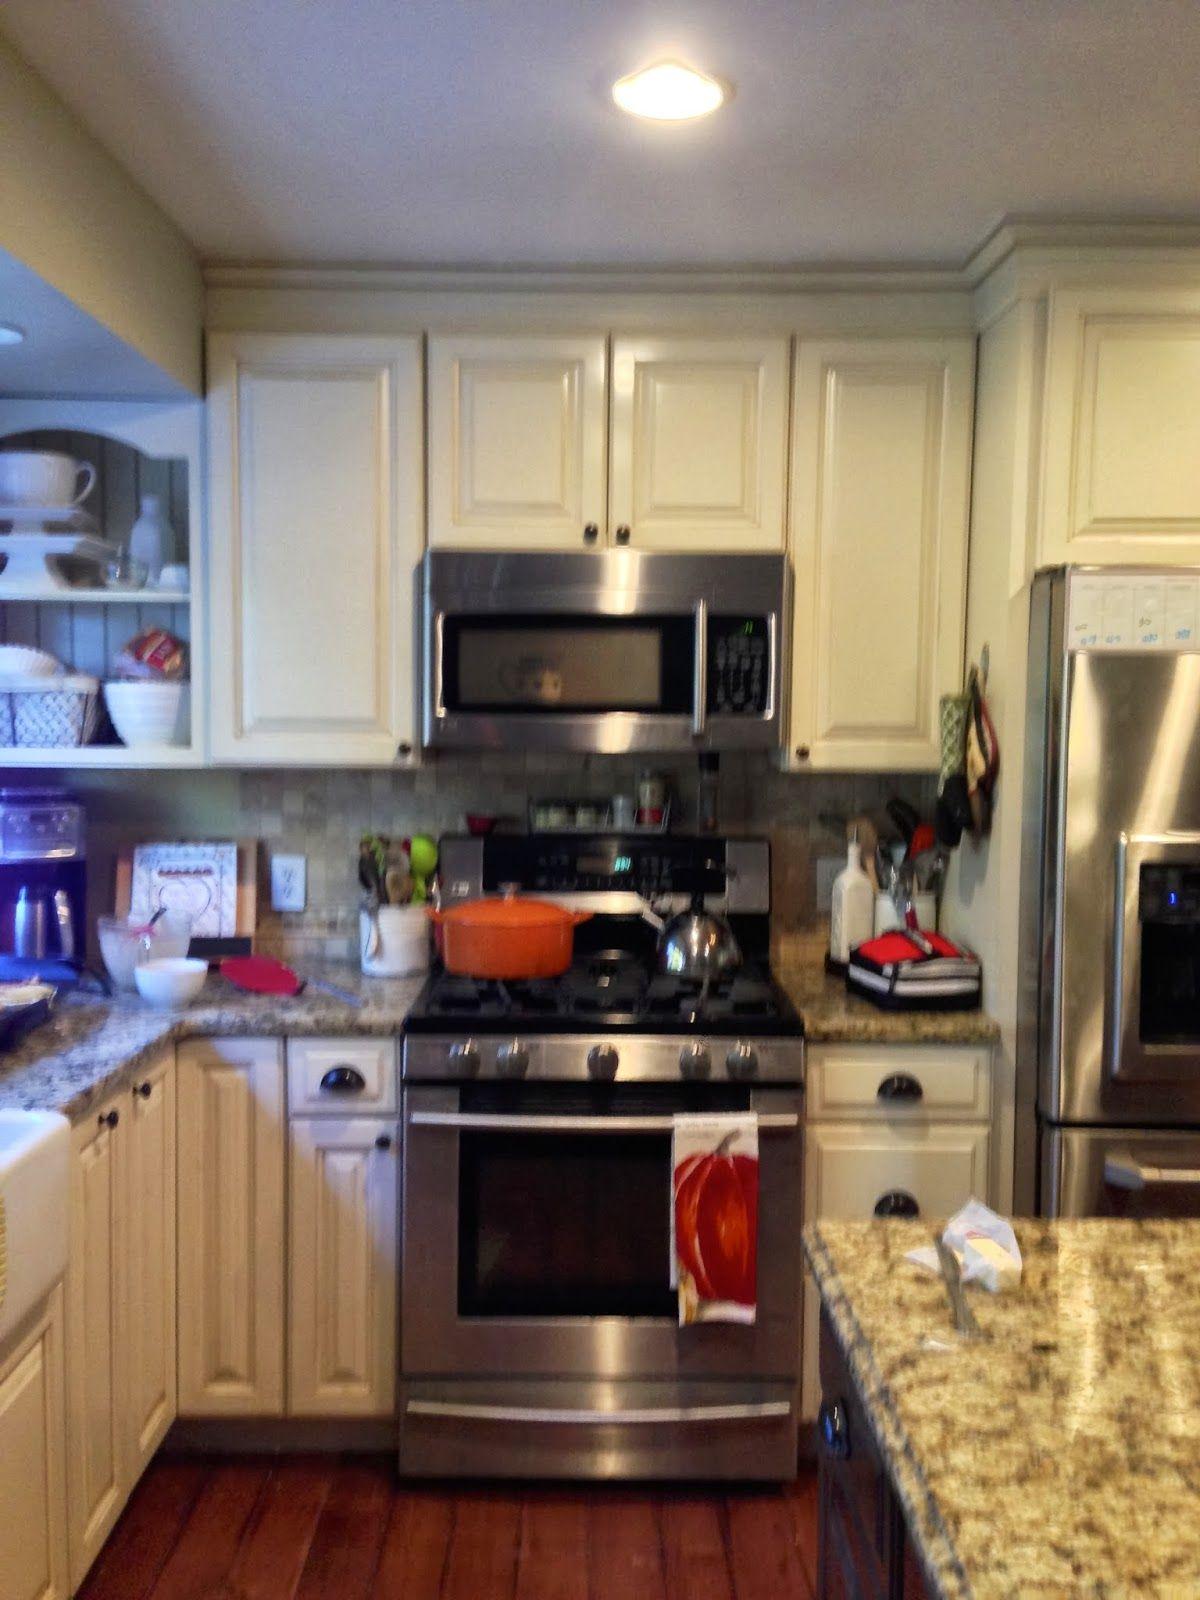 Diy Mantel Hood Tutorial Kitchen Hood Design Diy Mantel Updated Kitchen